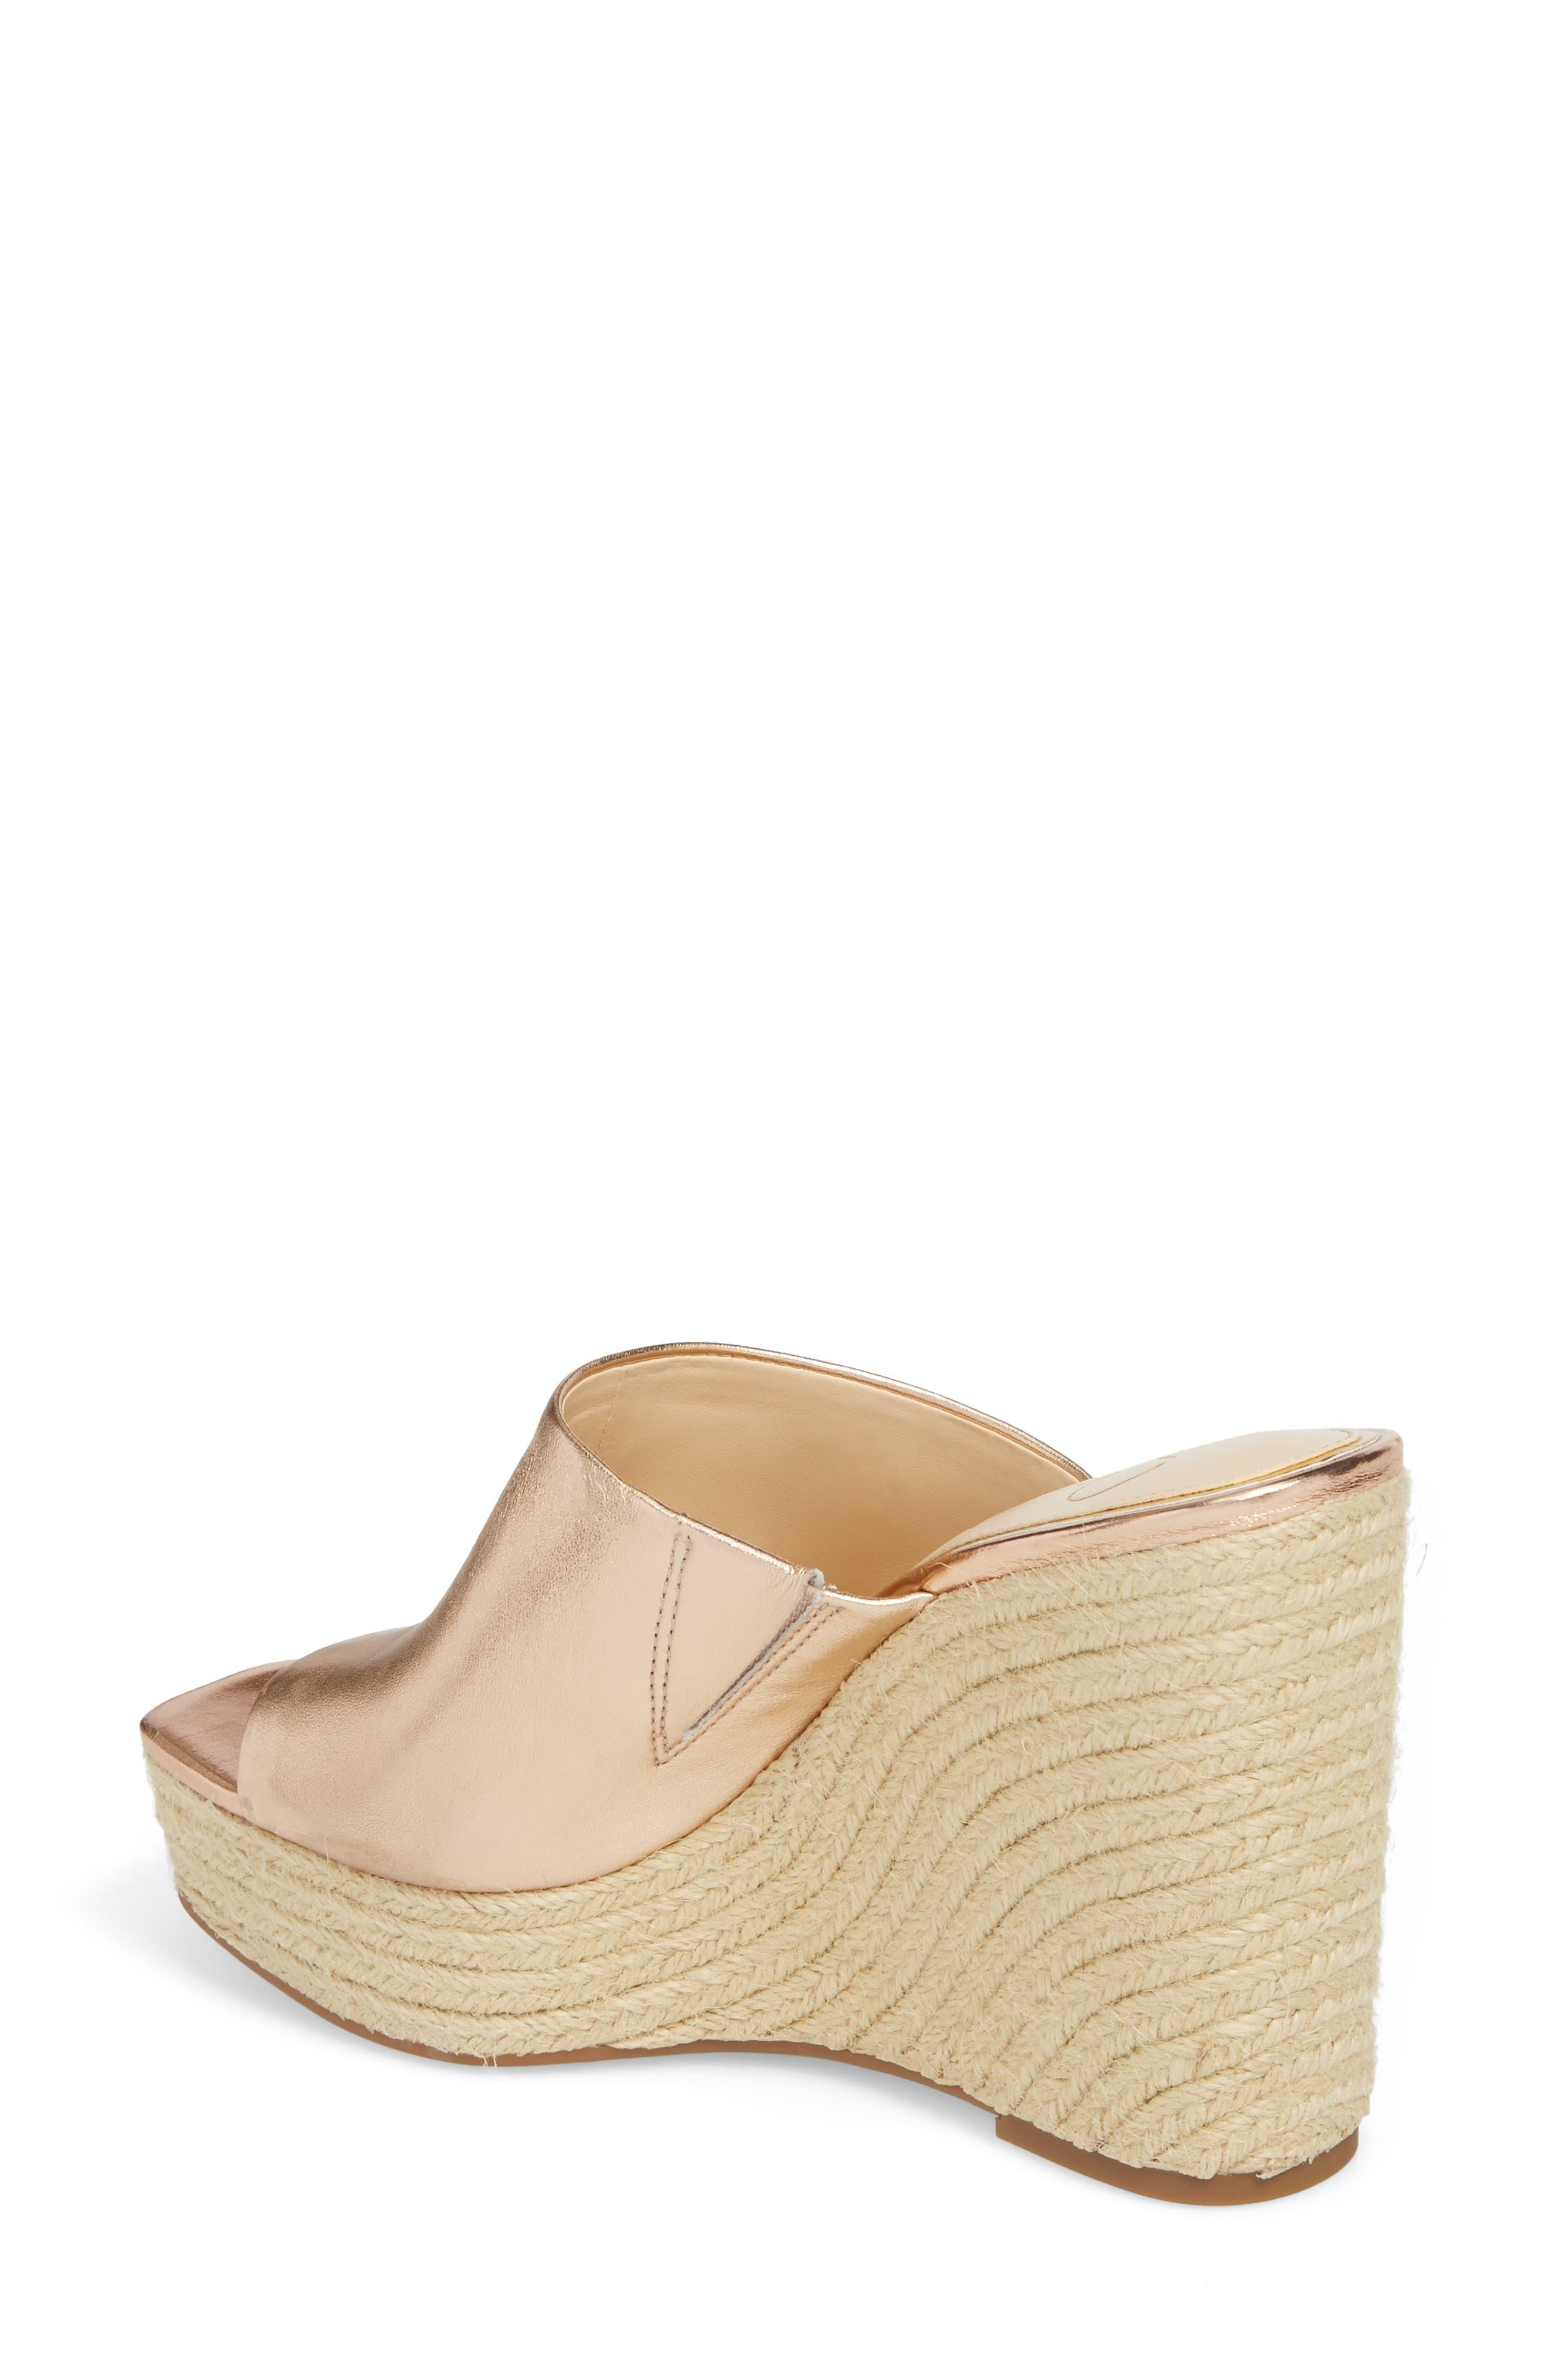 Sirella Platform Wedge Slide Sandal,                             Alternate thumbnail 2, color,                             Pale Rose Go